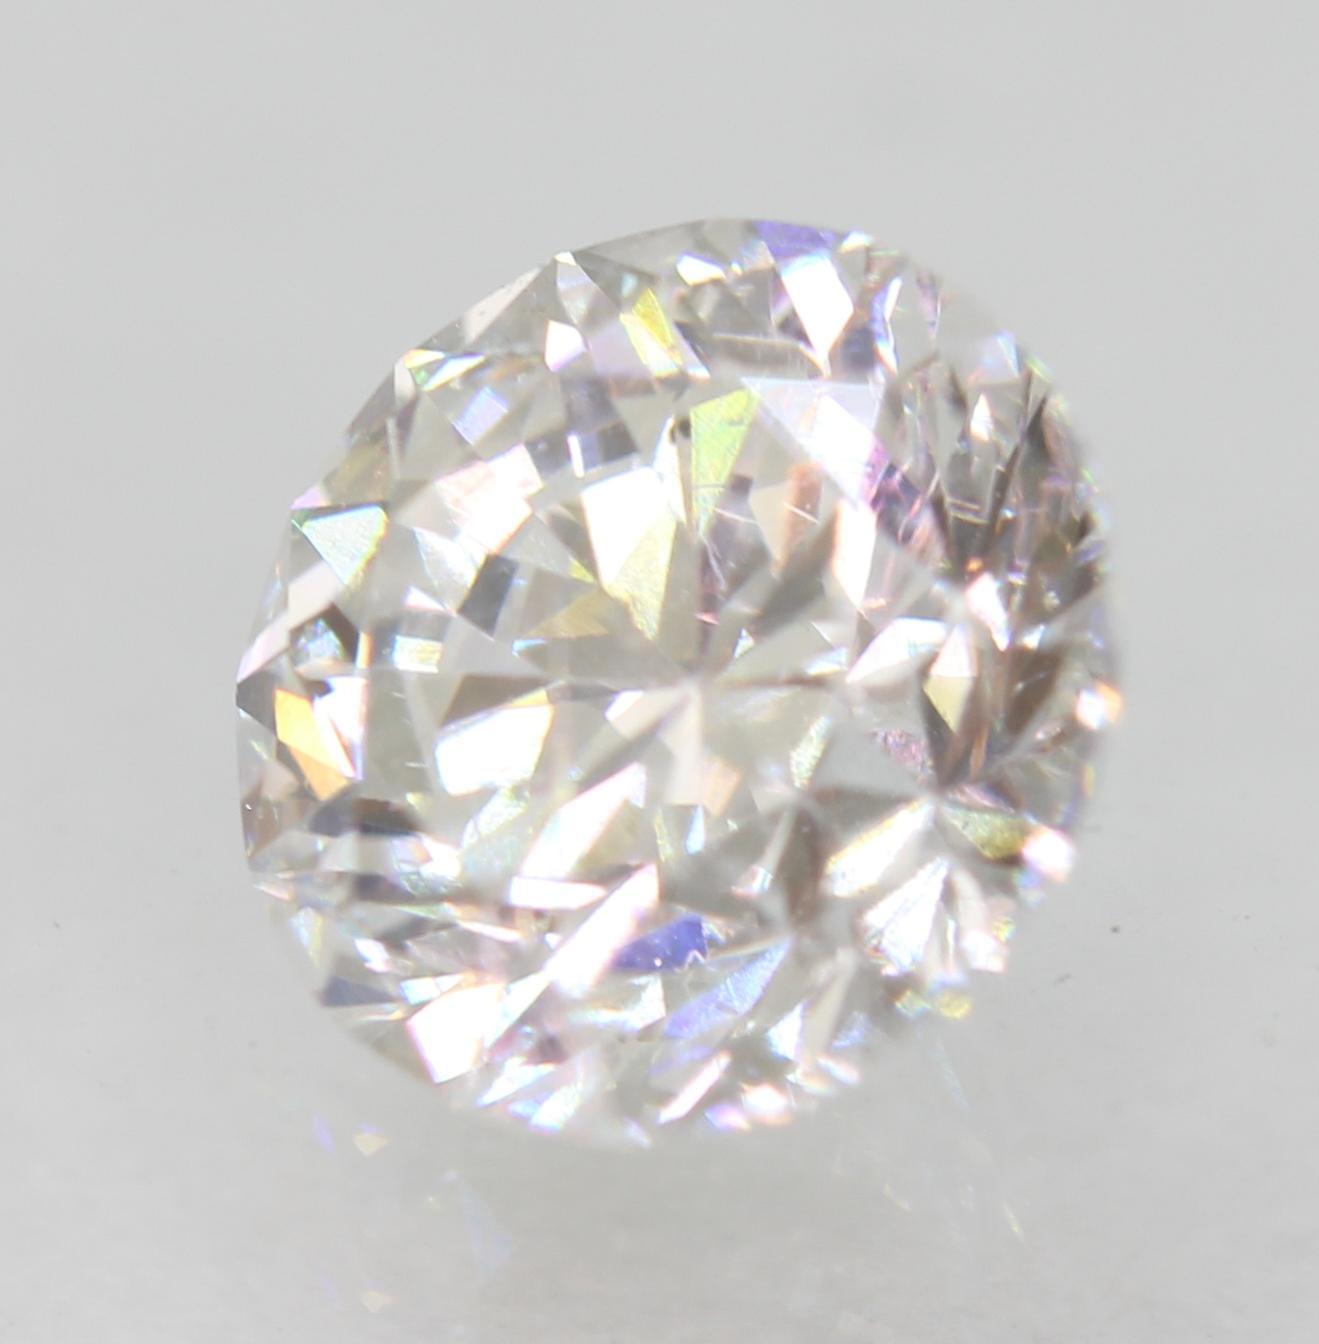 Certified 1.01 Carat D VS1 Round Brilliant Enhanced Natural Loose Diamond 6.19mm